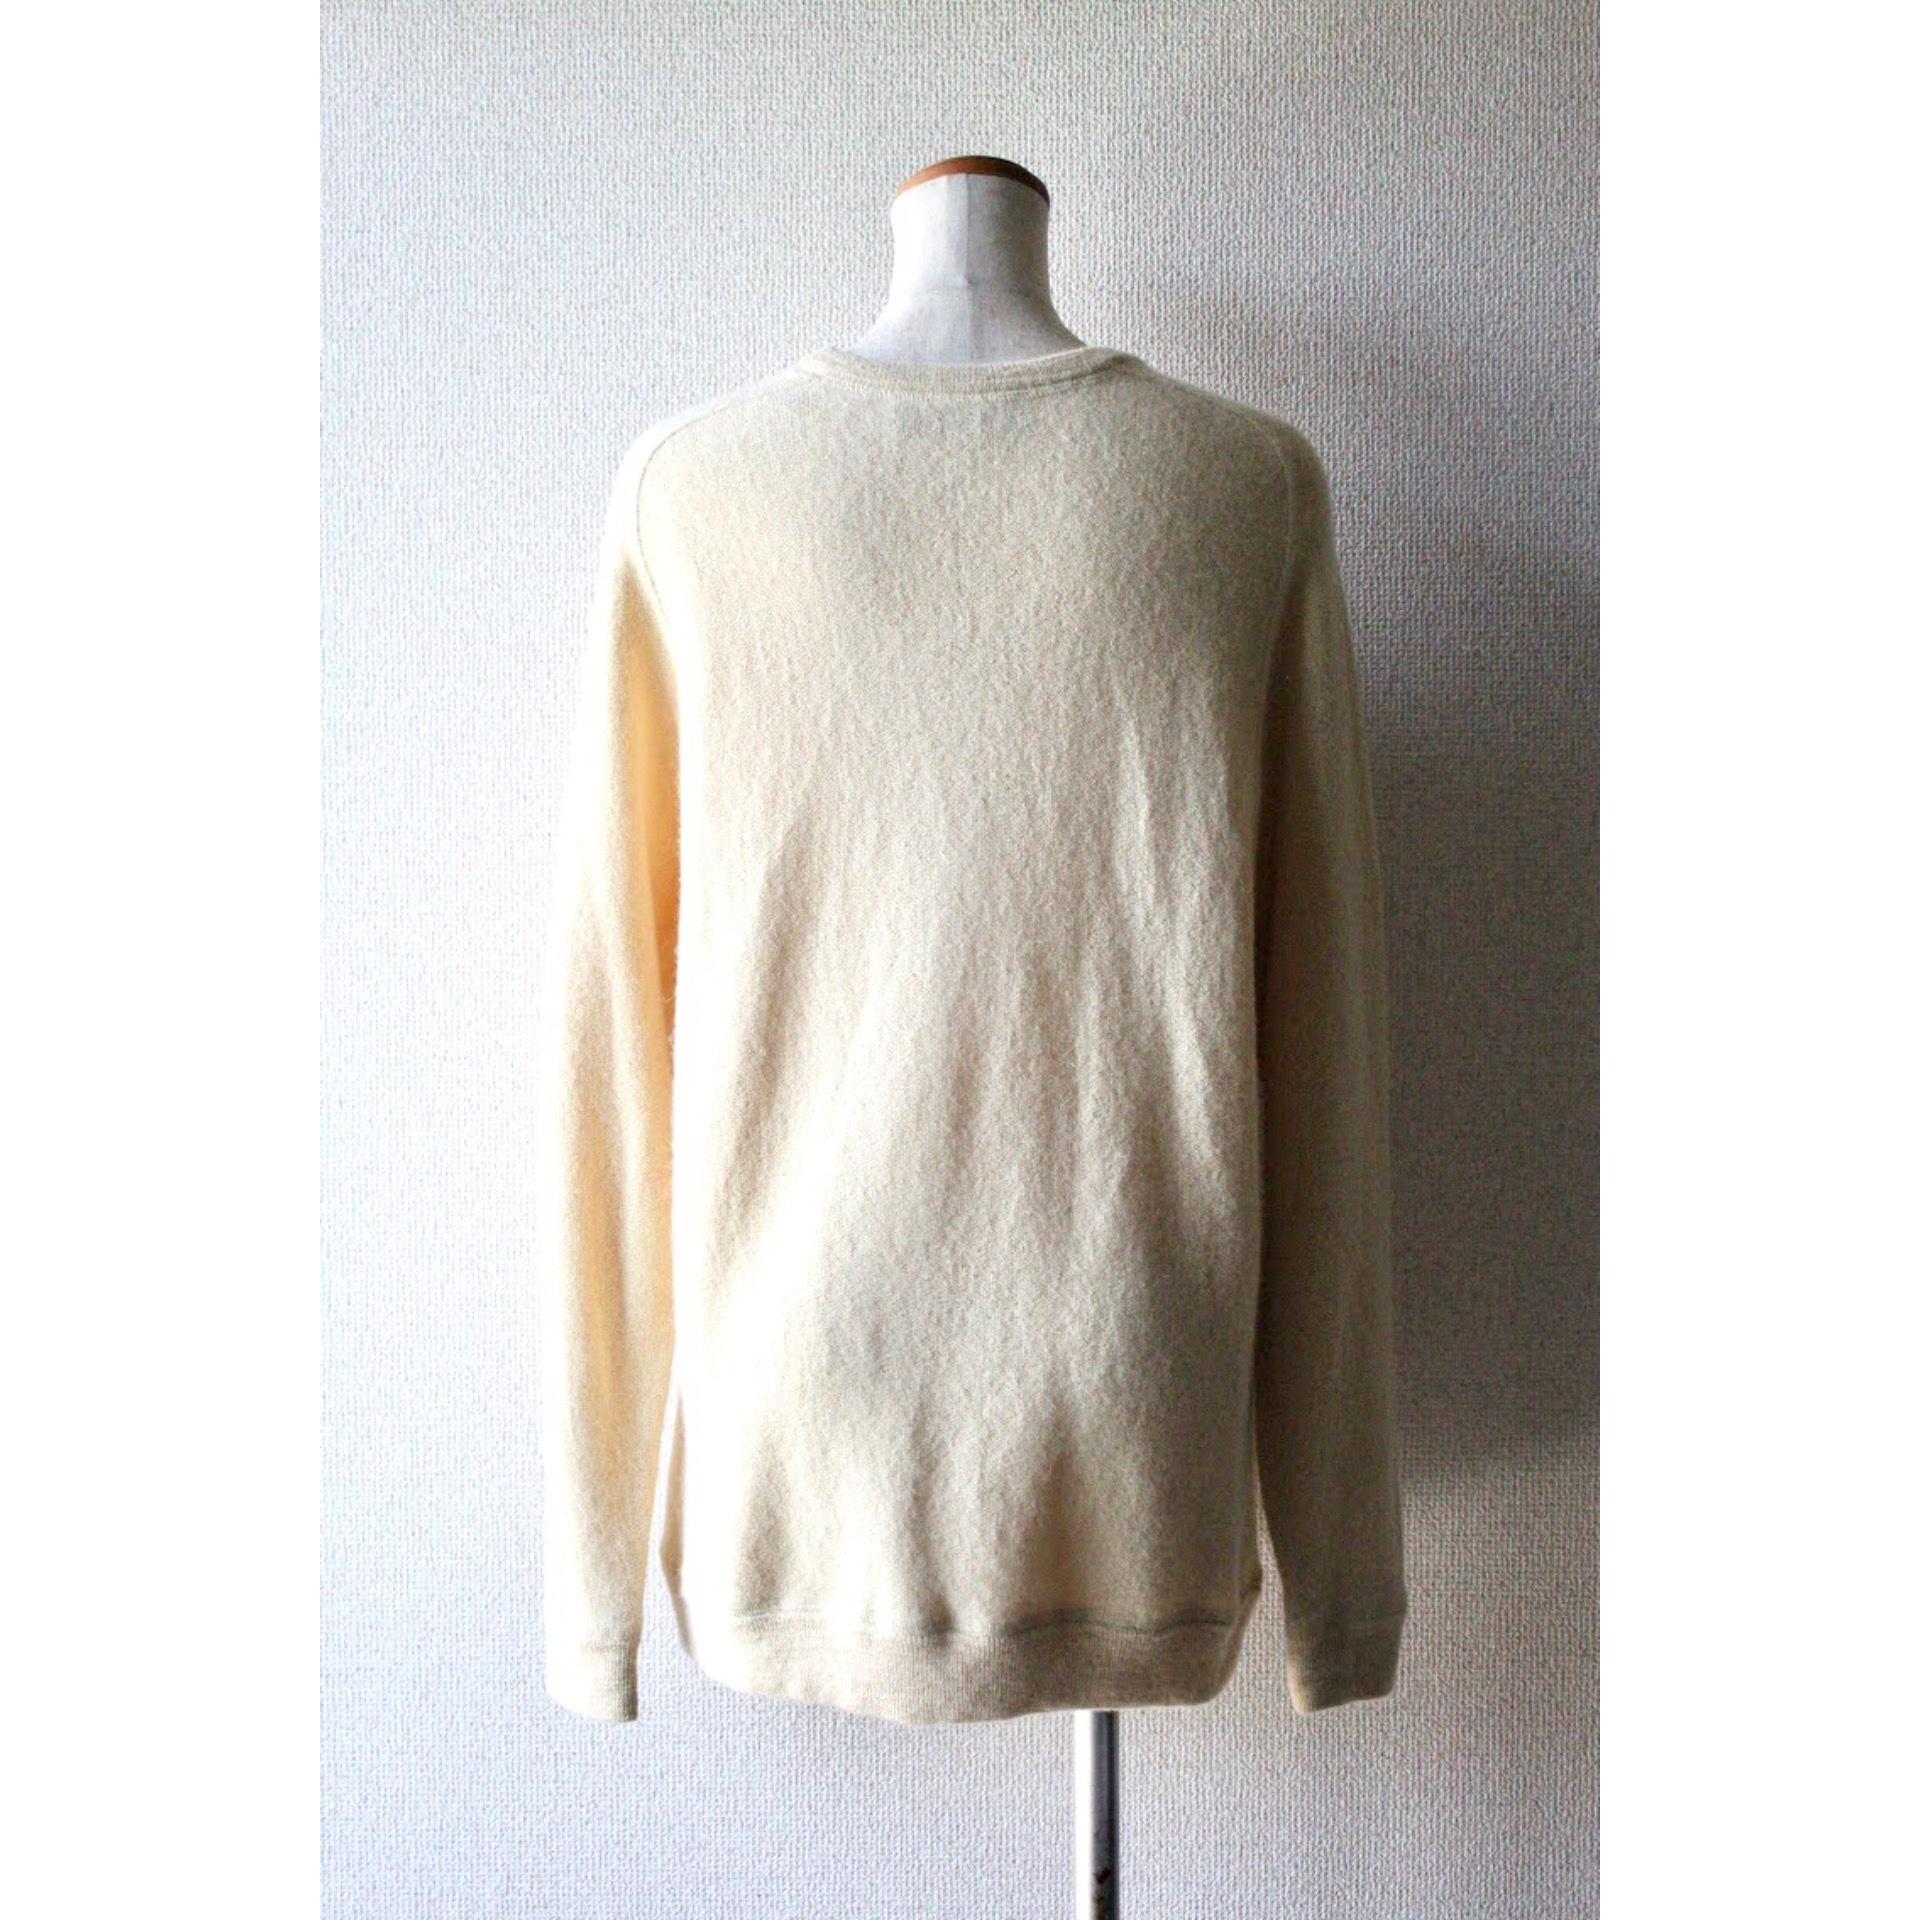 Vintage baby alpaca sweater